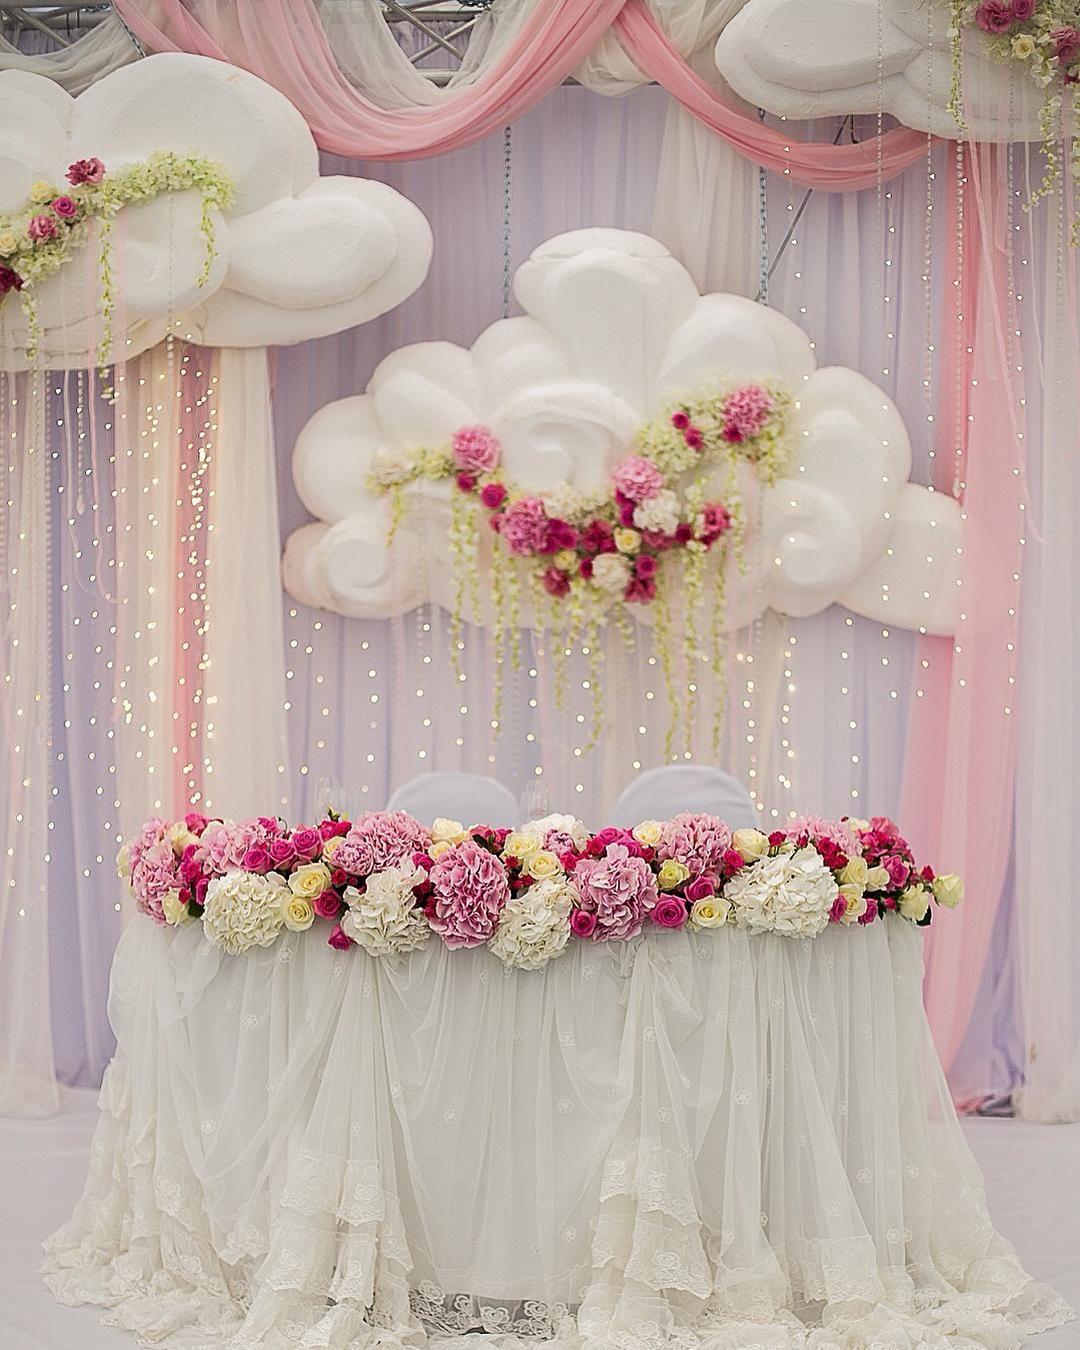 Nigerian wedding decoration images  Consulta esta foto de Instagram de russkiesezony u  Me gusta